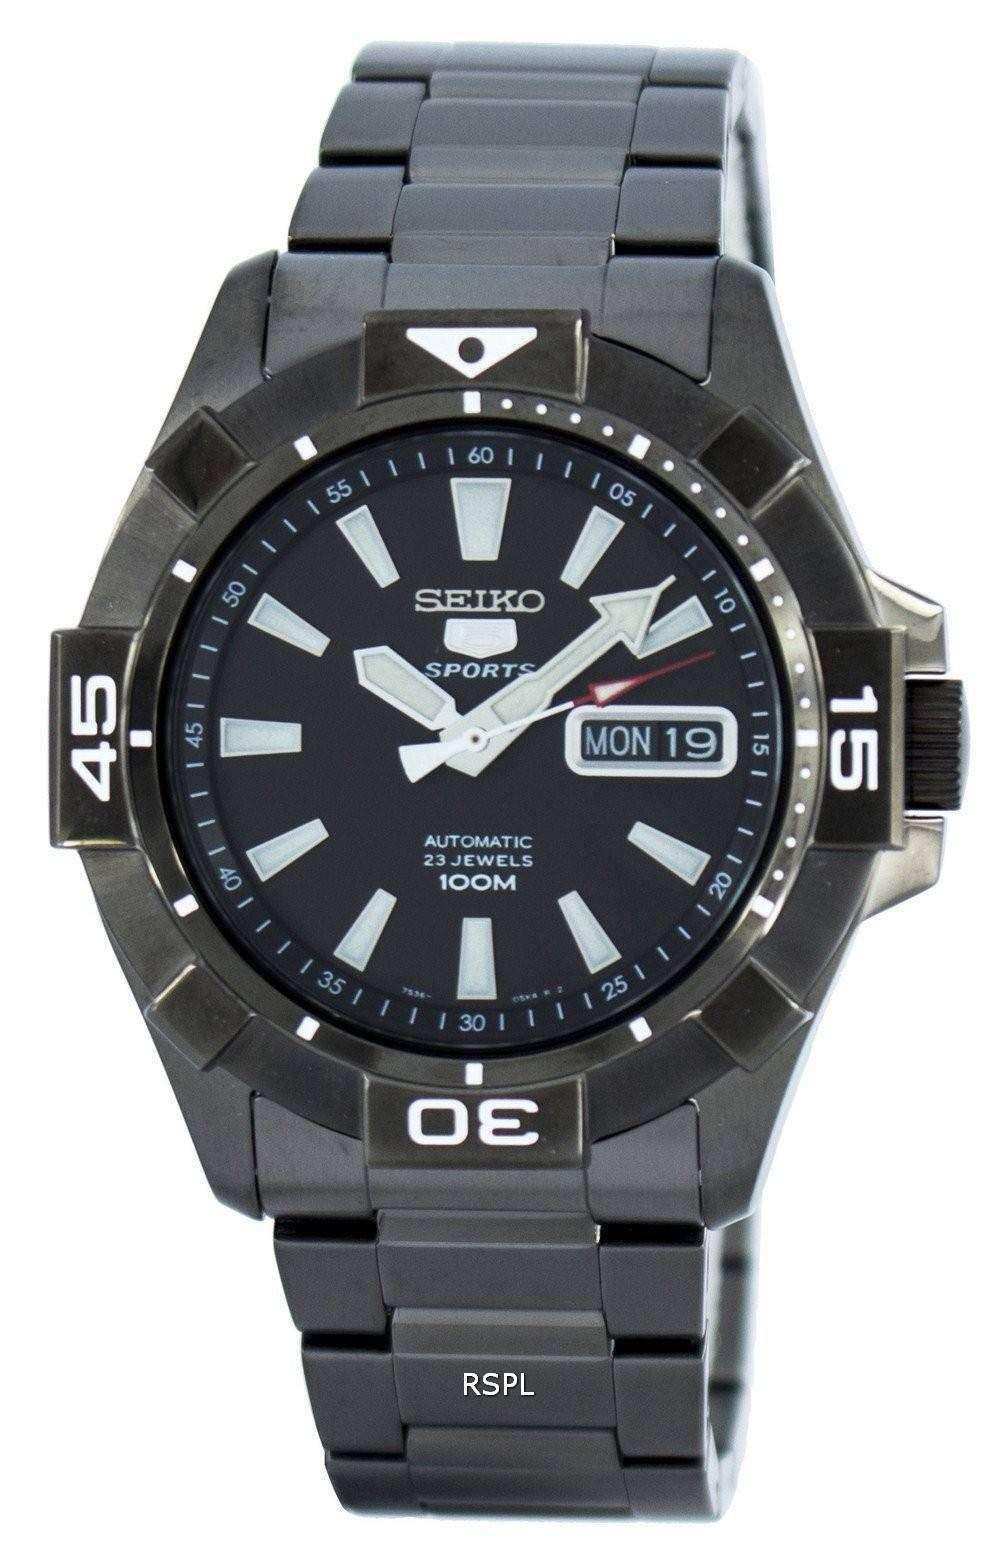 Seiko 5 Sports Automatic 23 Jewels SNZH15 SNZH15K1 SNZH15K ...